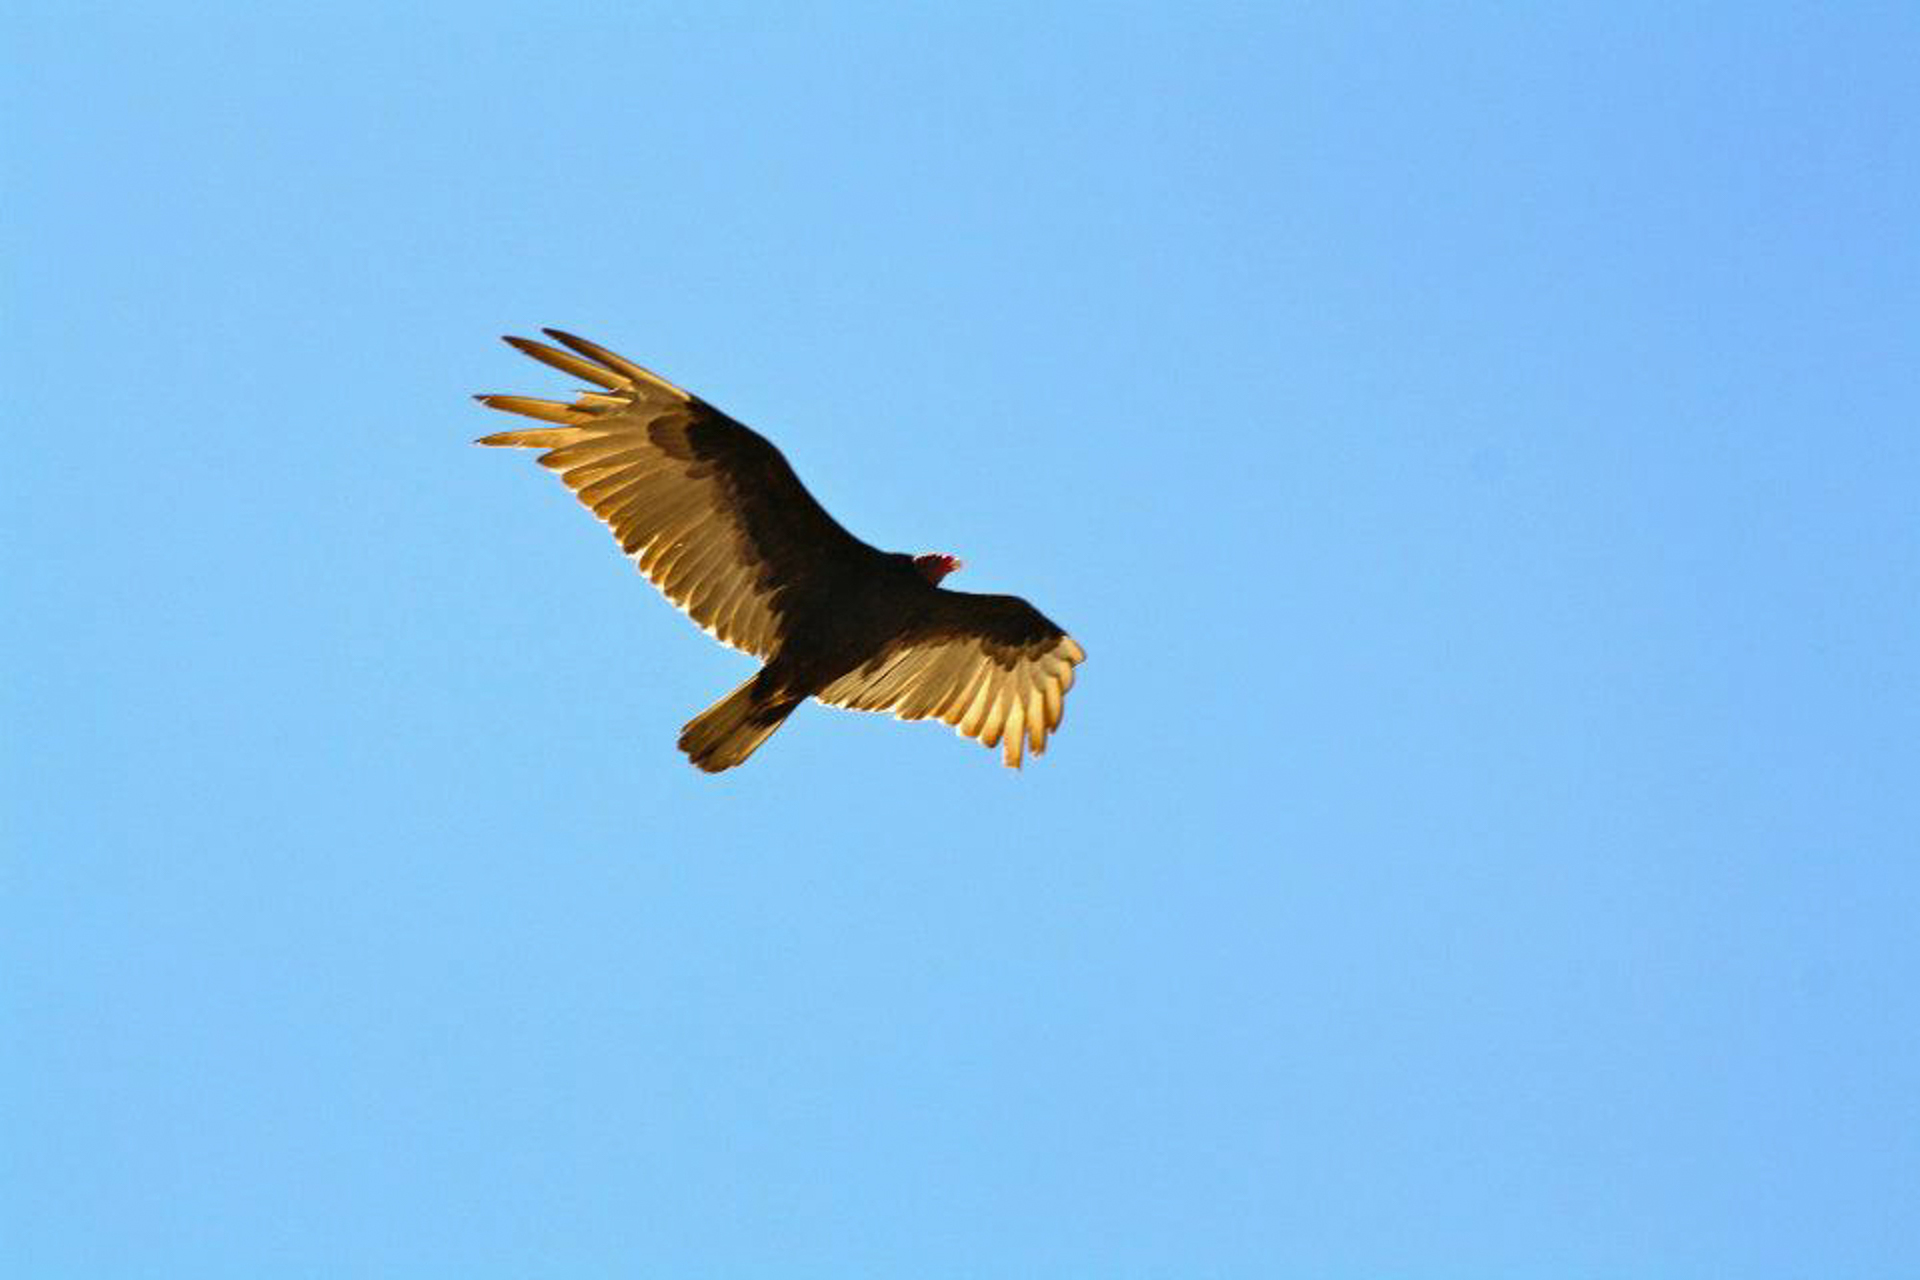 Poderío águila 🦅  | wing, side view, seagulls, daylight